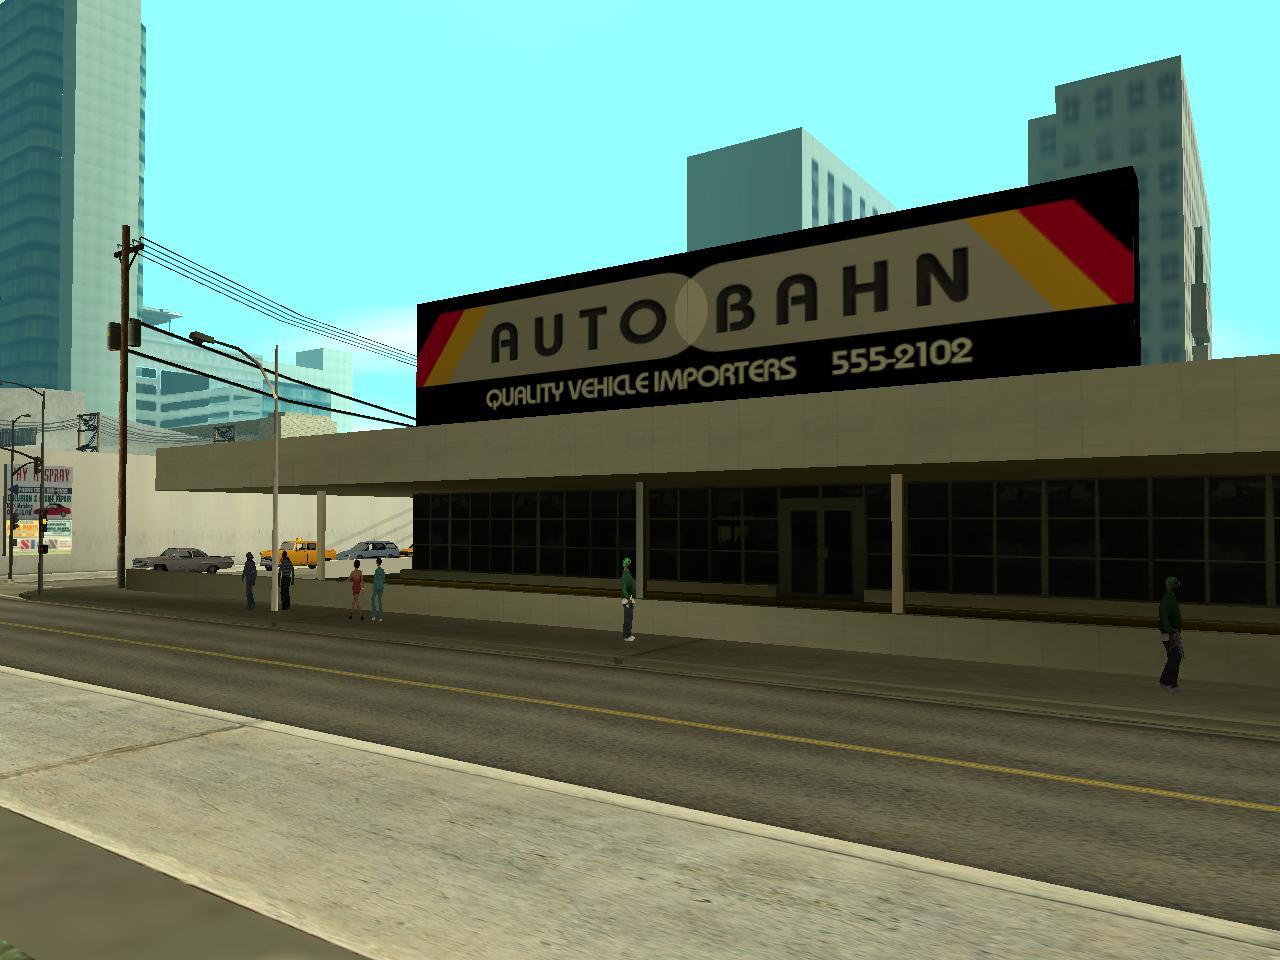 Auto Bahn